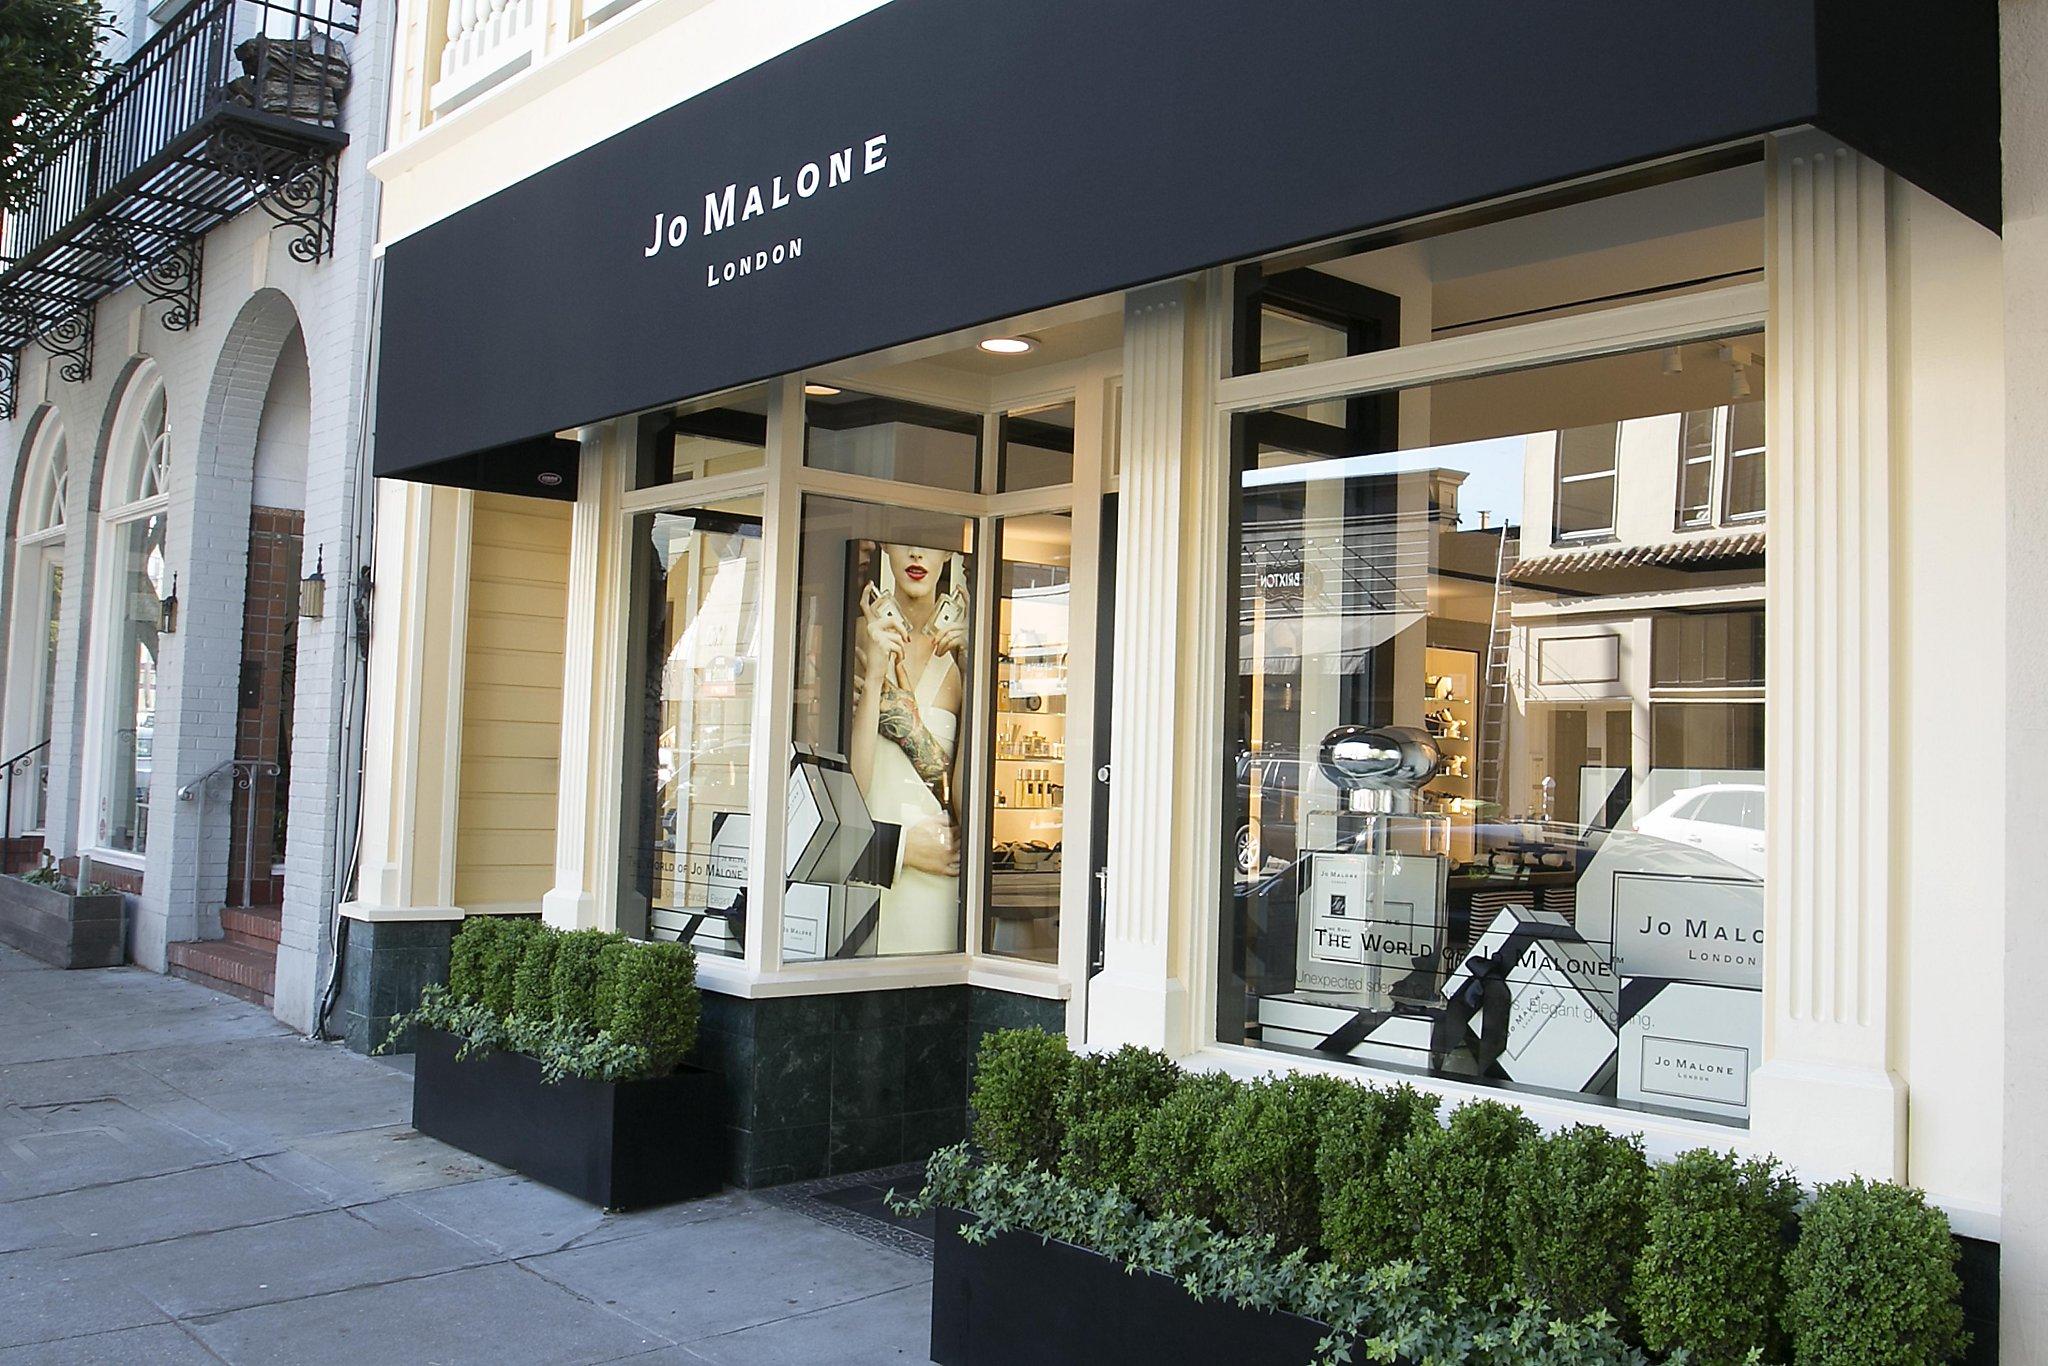 Jo malone london british perfumery opens in sf san for Window design jobs london